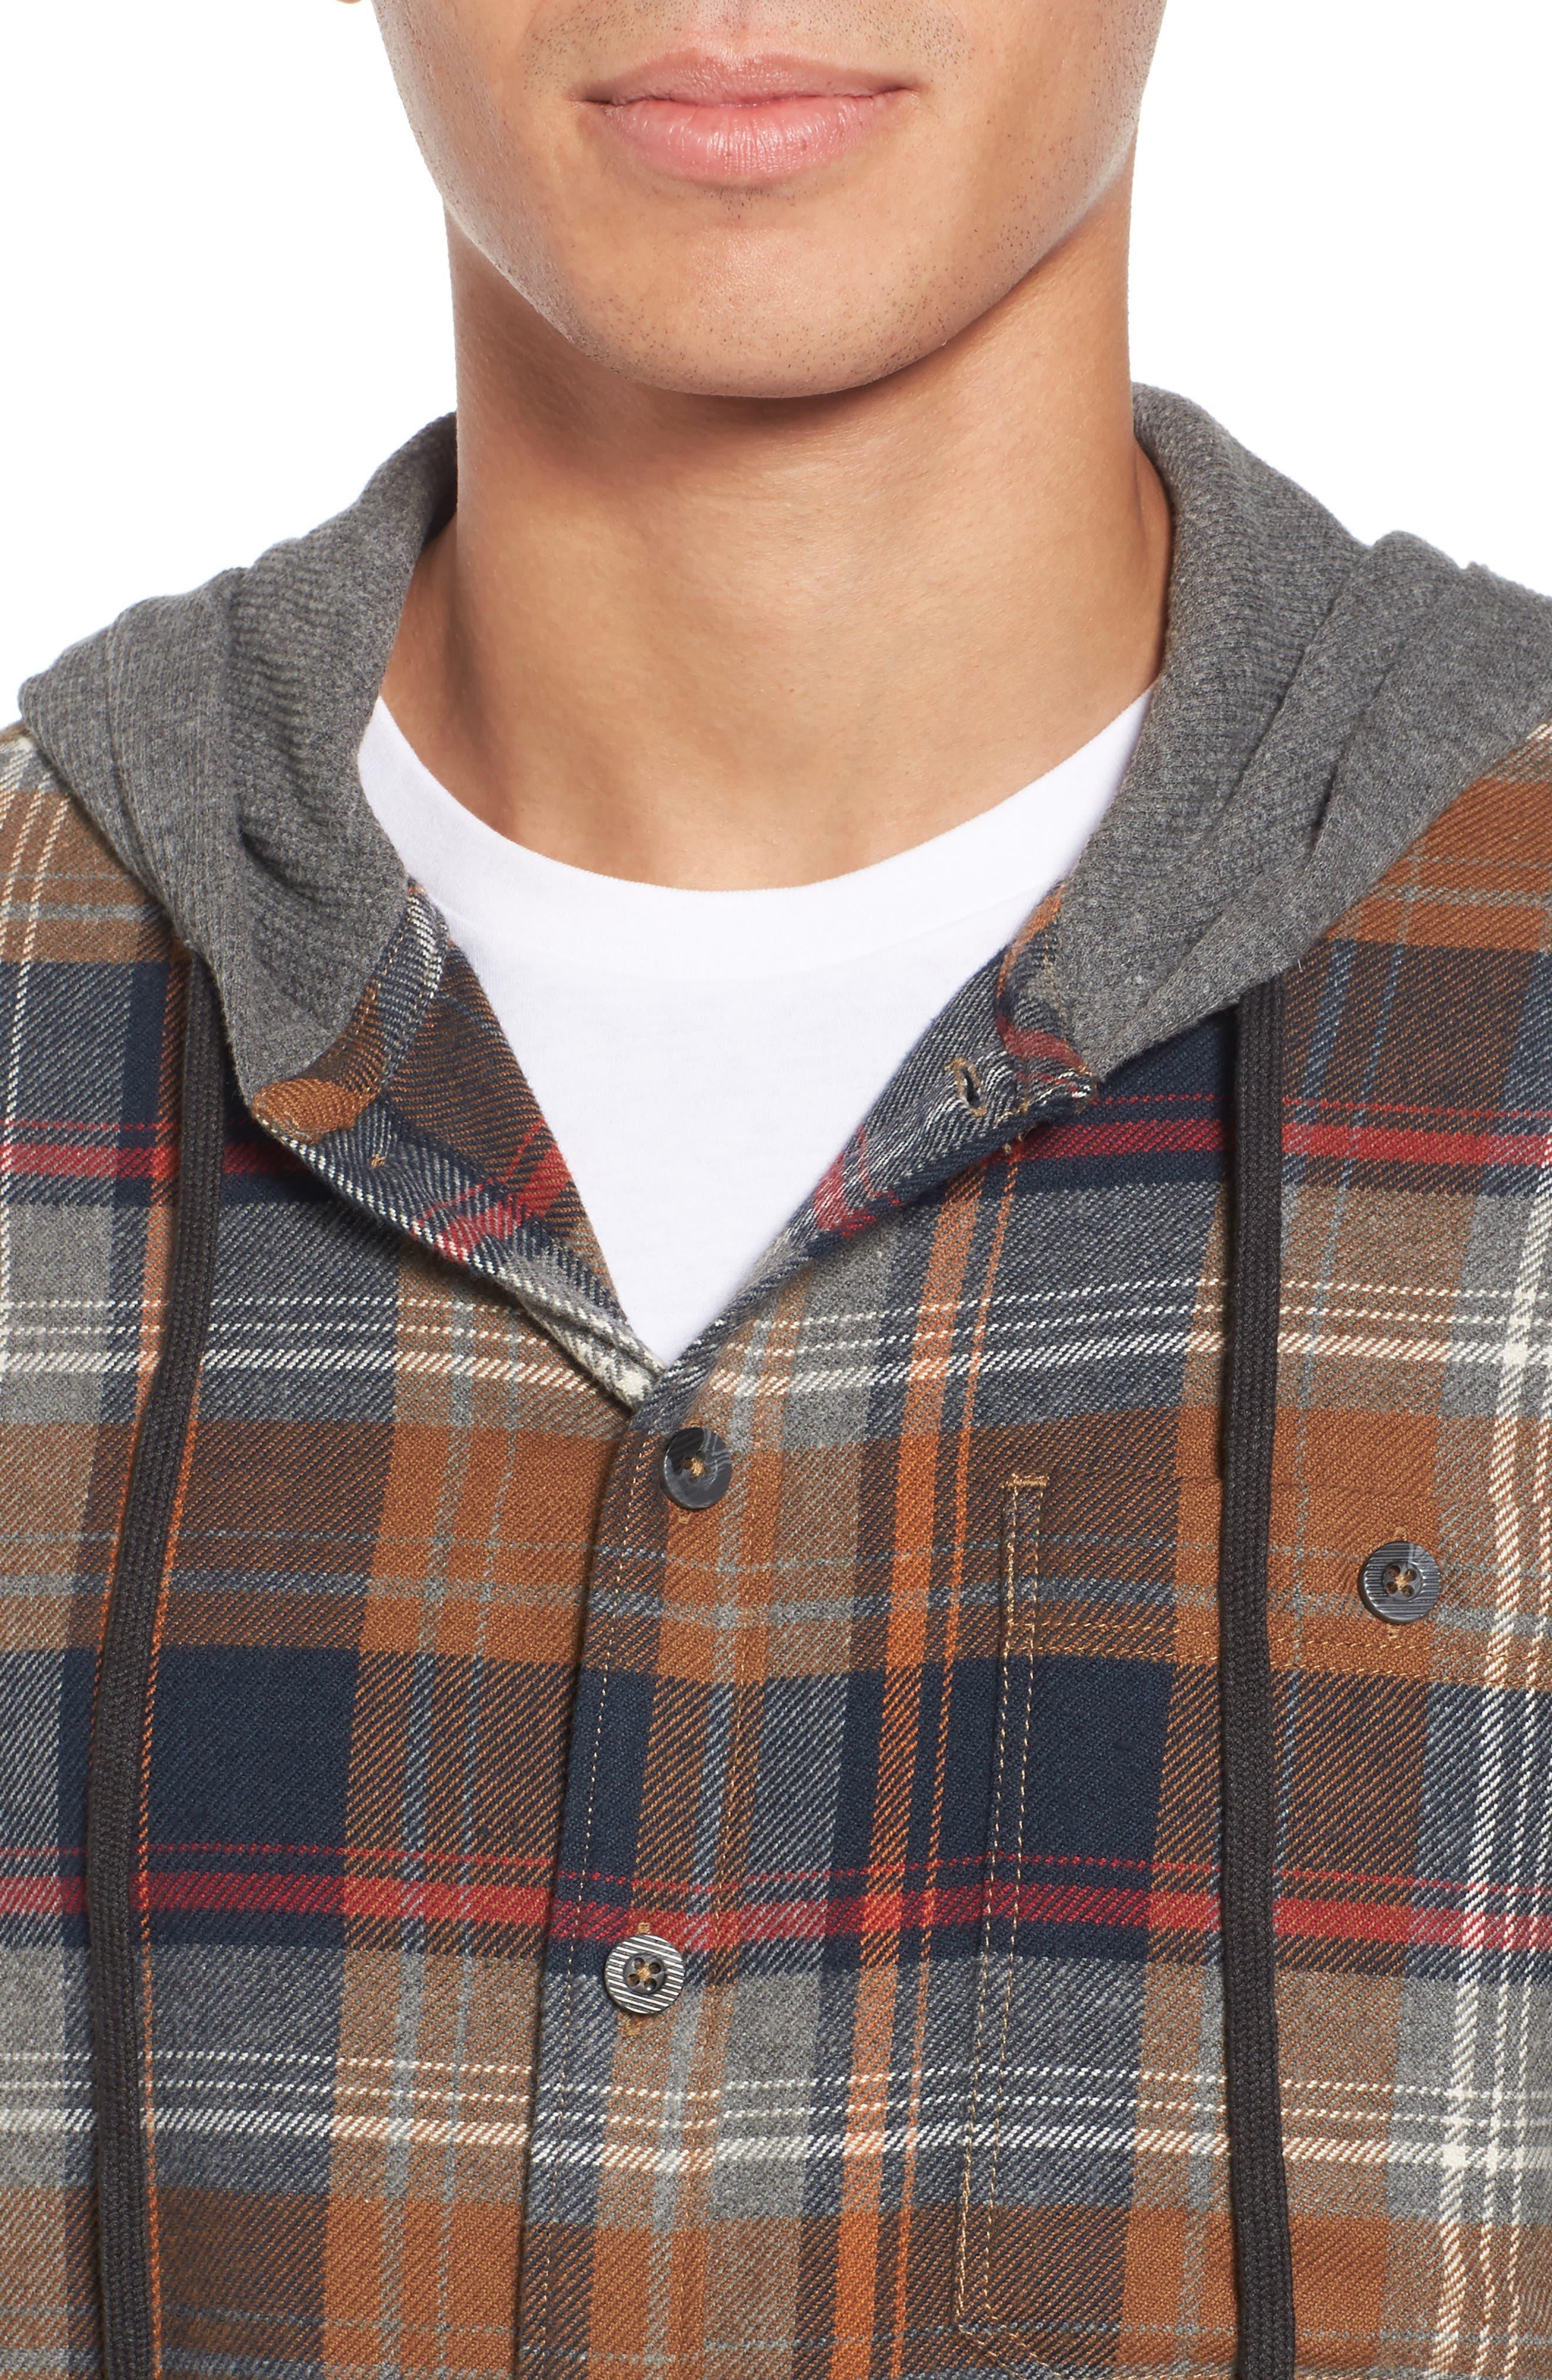 Baja Hooded Flannel Shirt,                             Alternate thumbnail 4, color,                             204